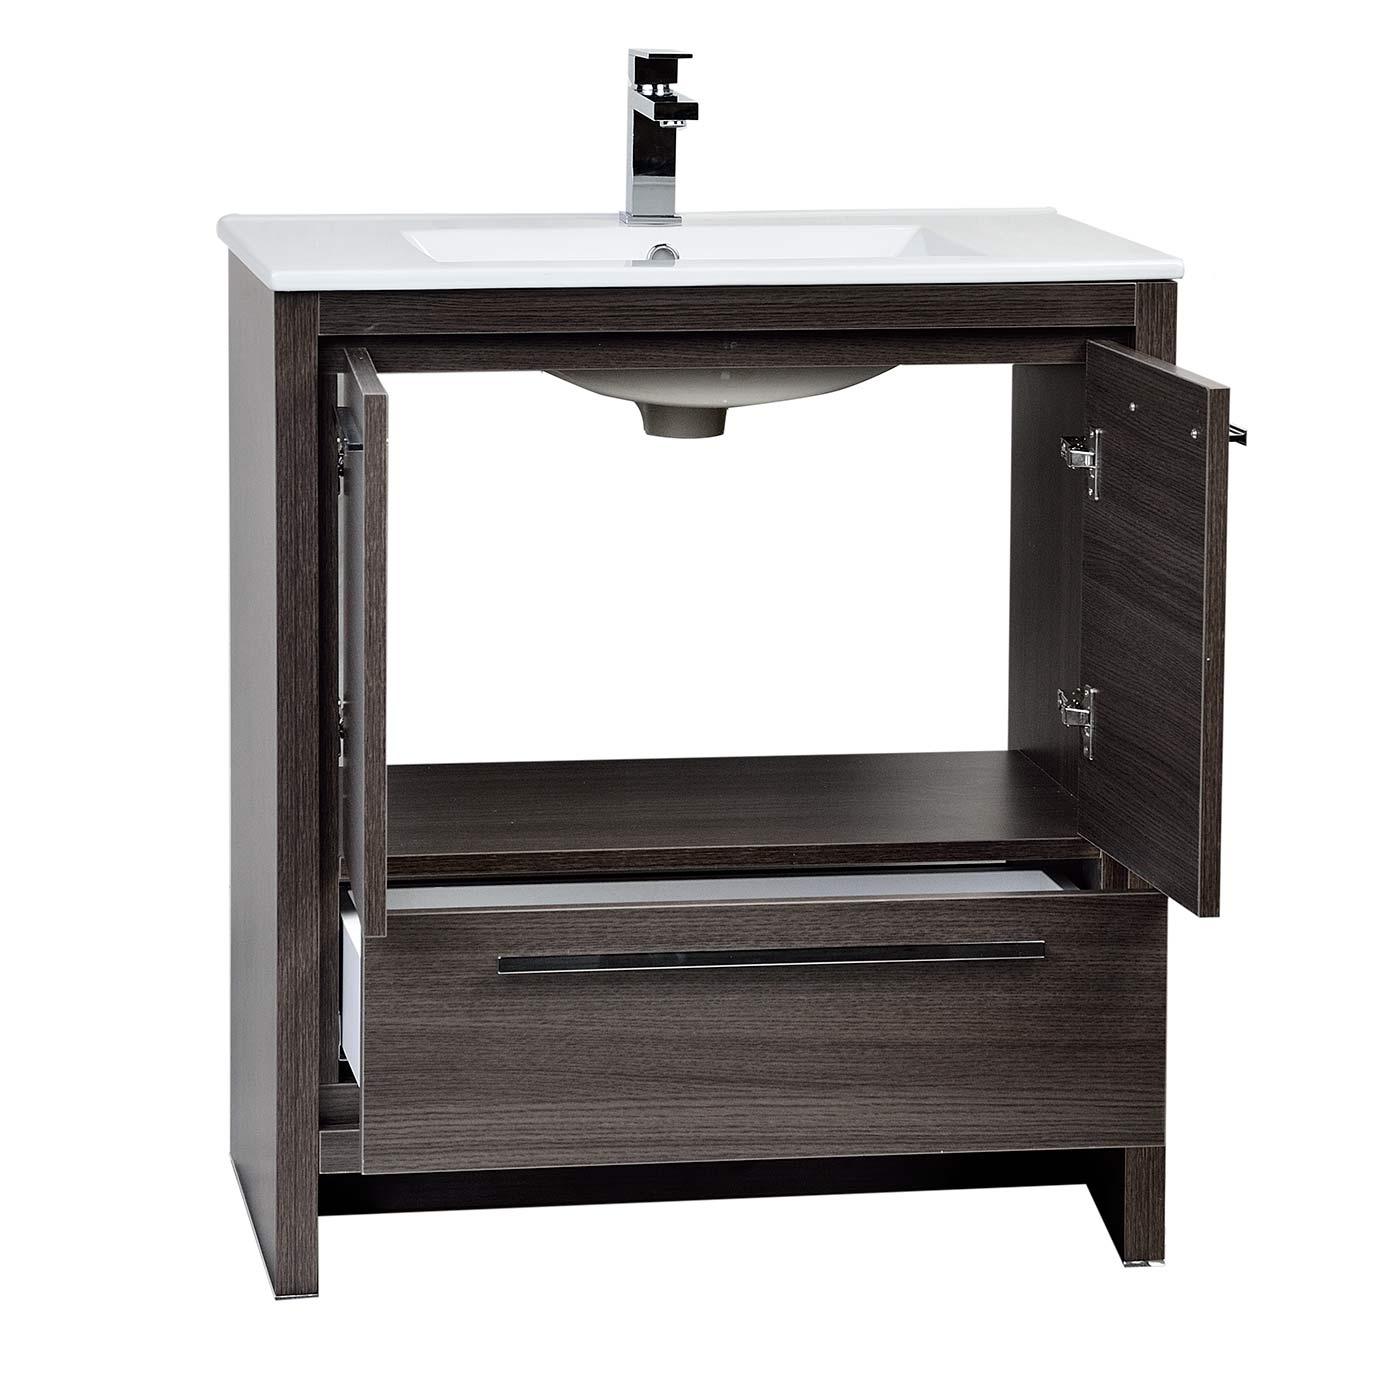 Buy CBI Enna 29 5 Inch Grey Oak Modern Bathroom Vanity TN LA750 GO on ConcepB